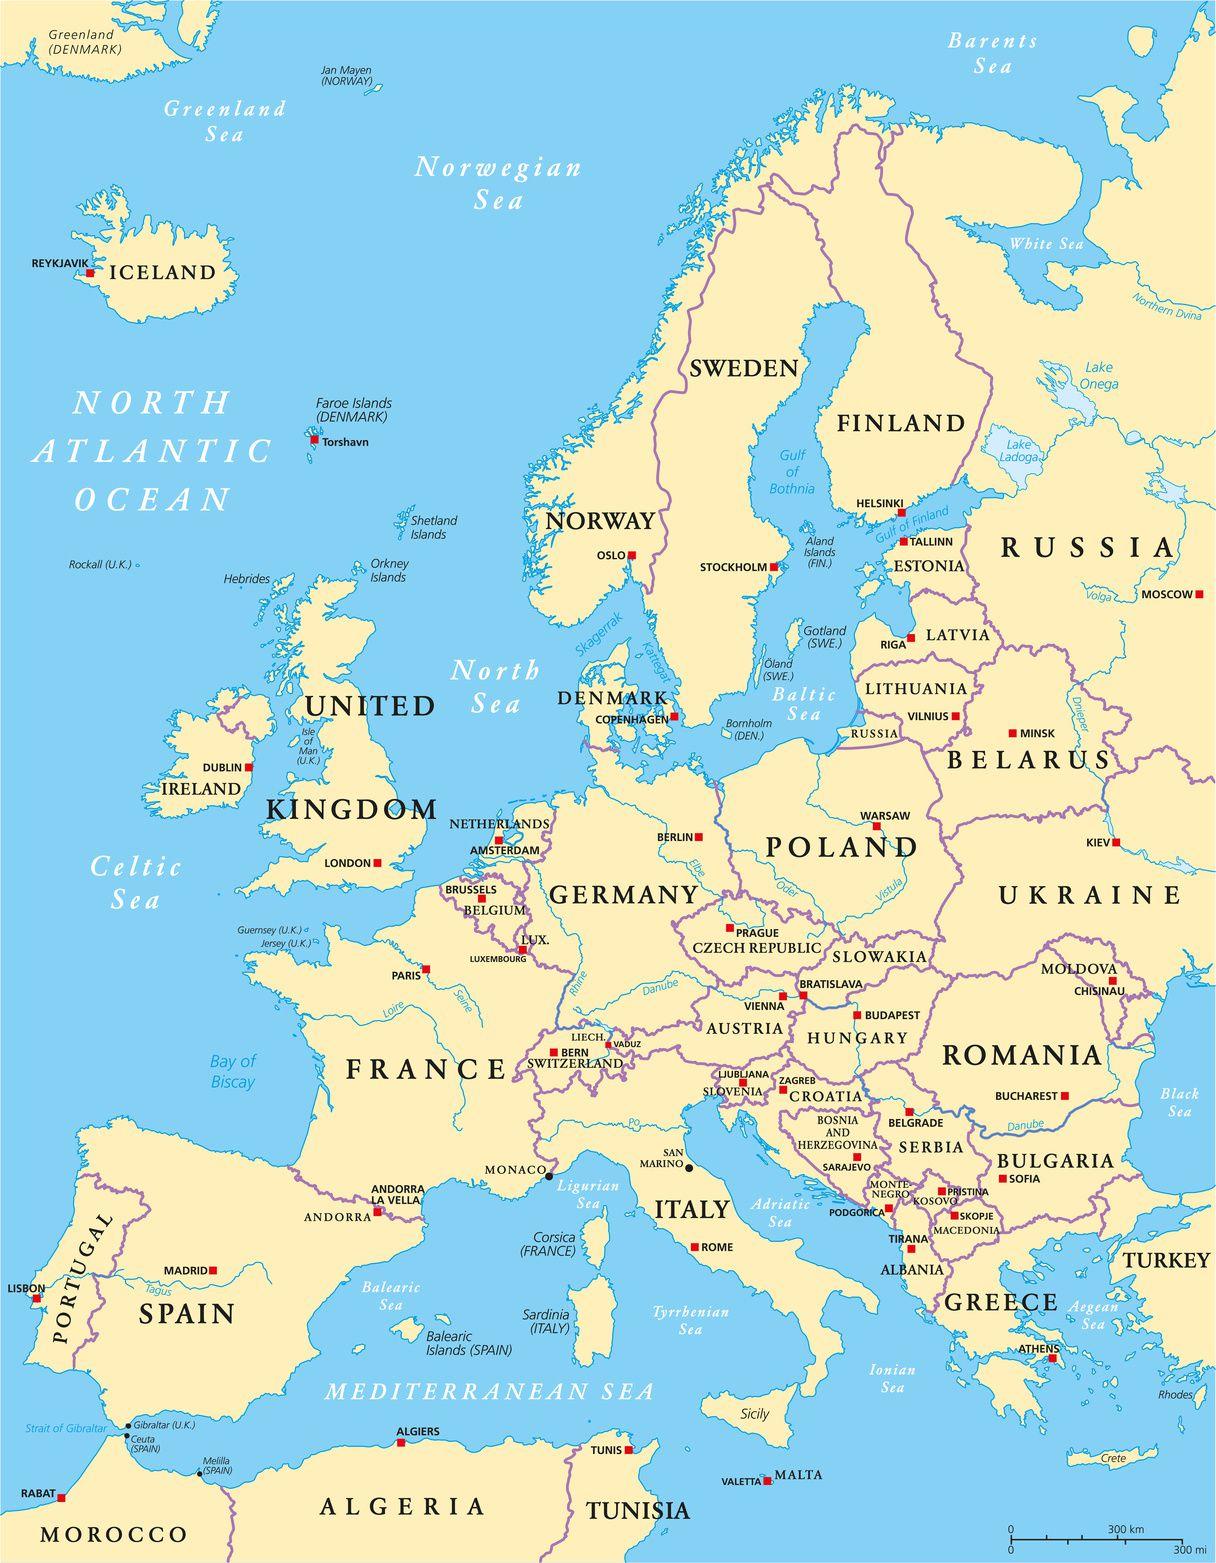 Cartes De Leurope - Romes.danapardaz.co encequiconcerne Carte De L Europe 2017